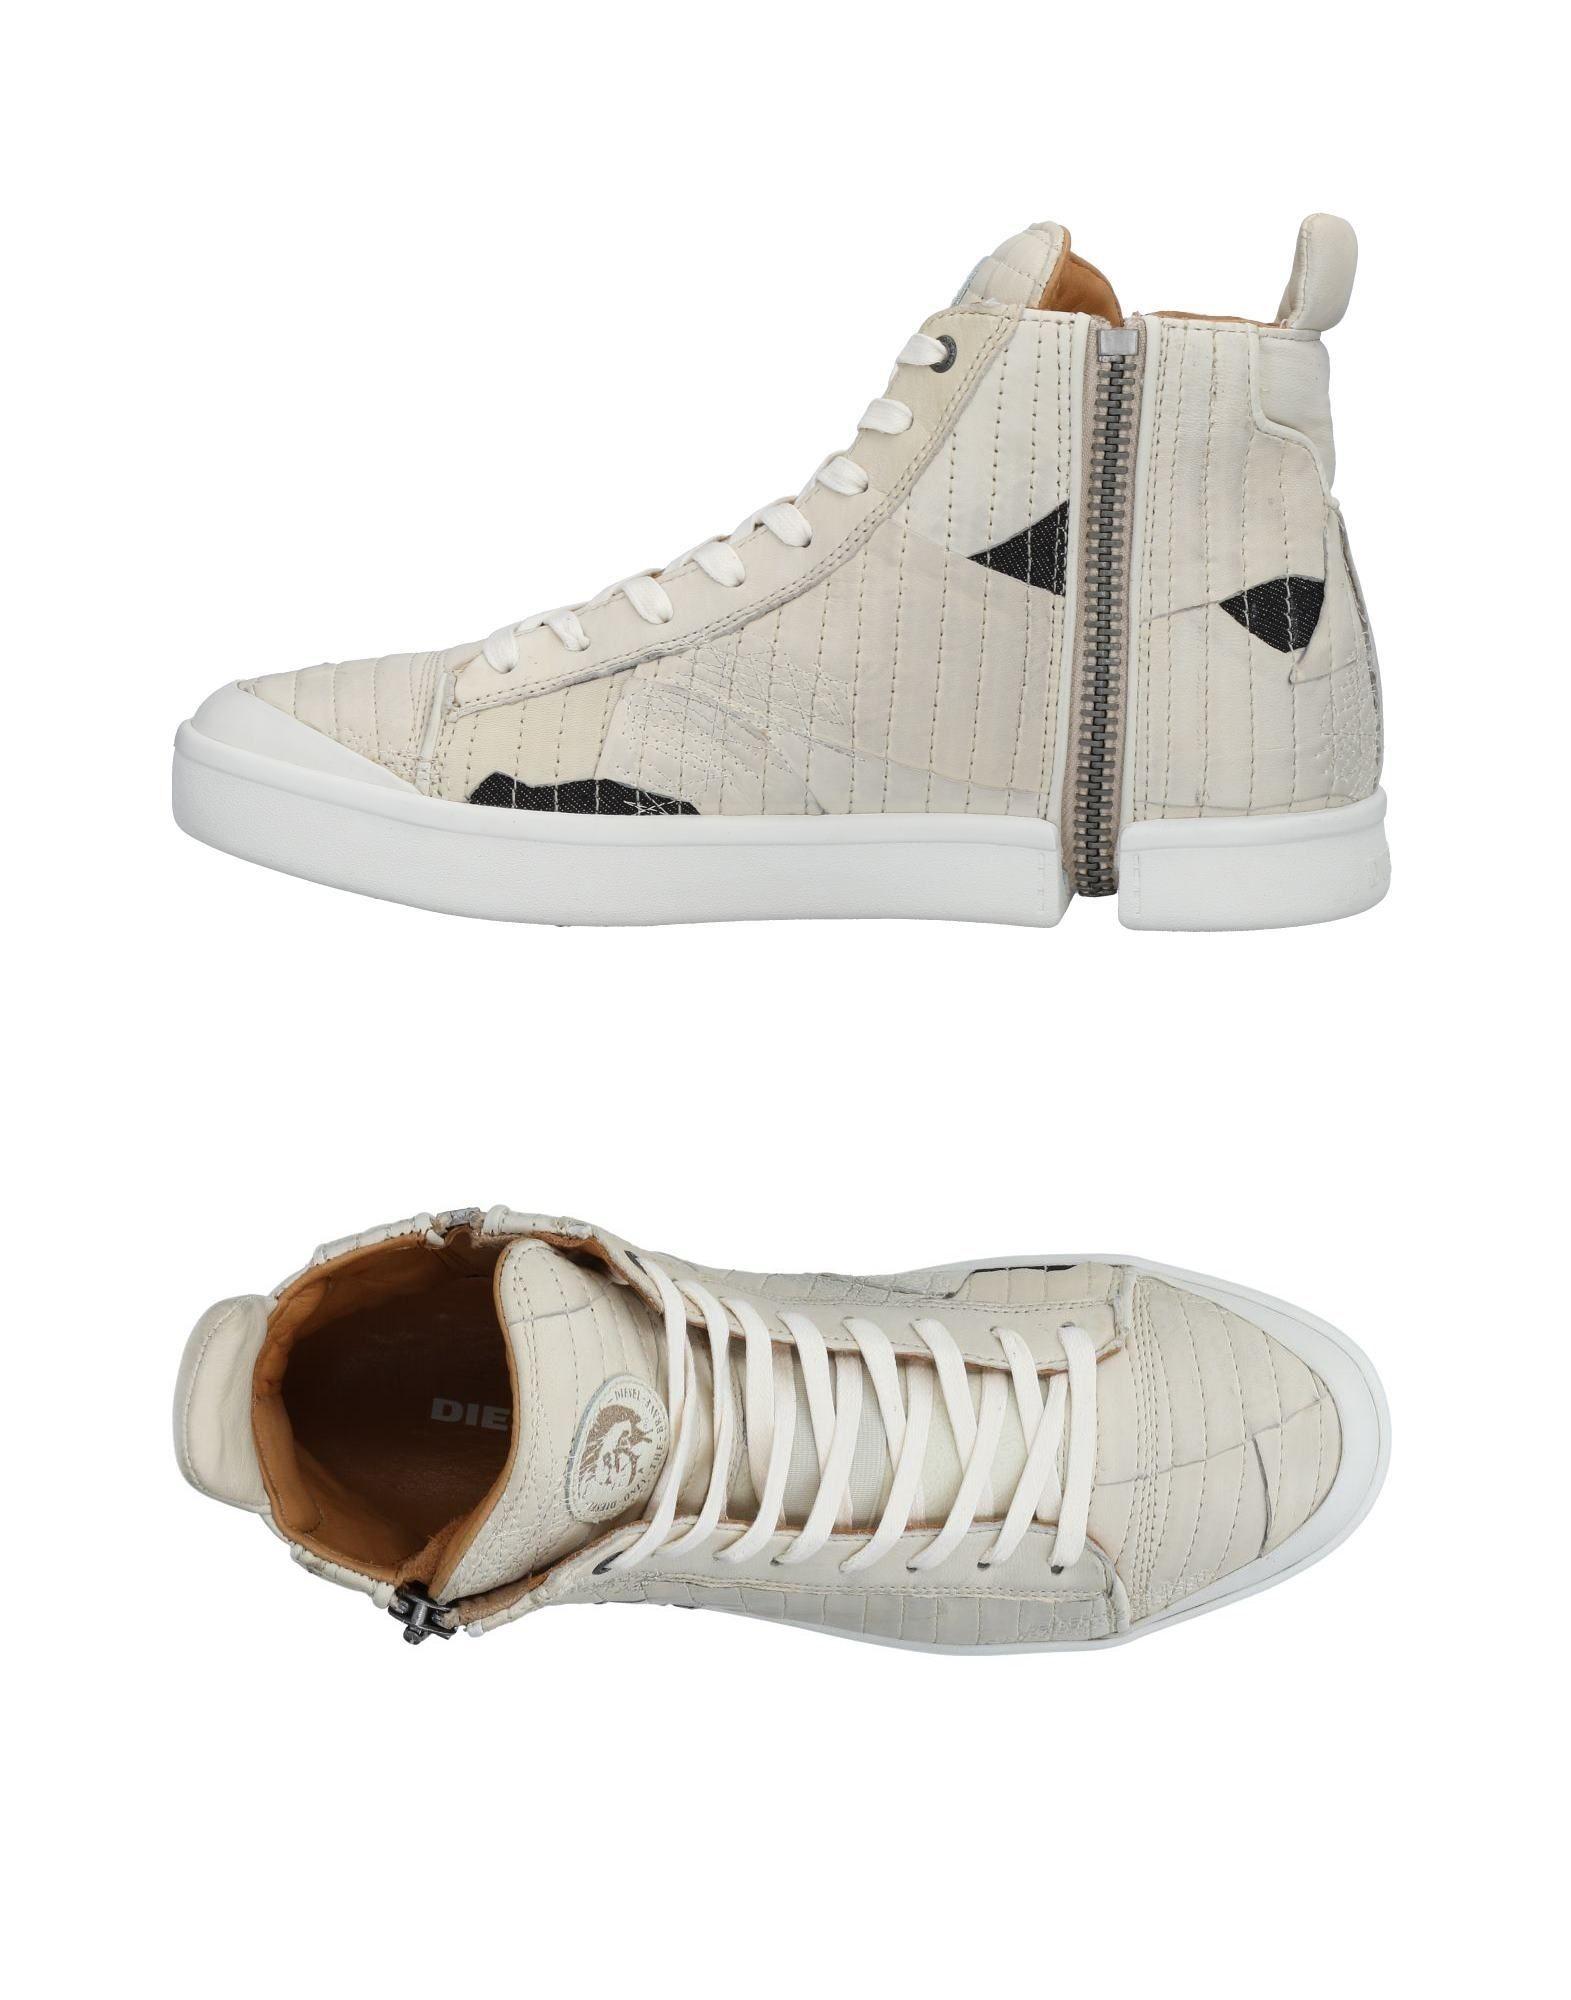 Diesel Sneakers Herren  11476684CD Gute Qualität beliebte Schuhe